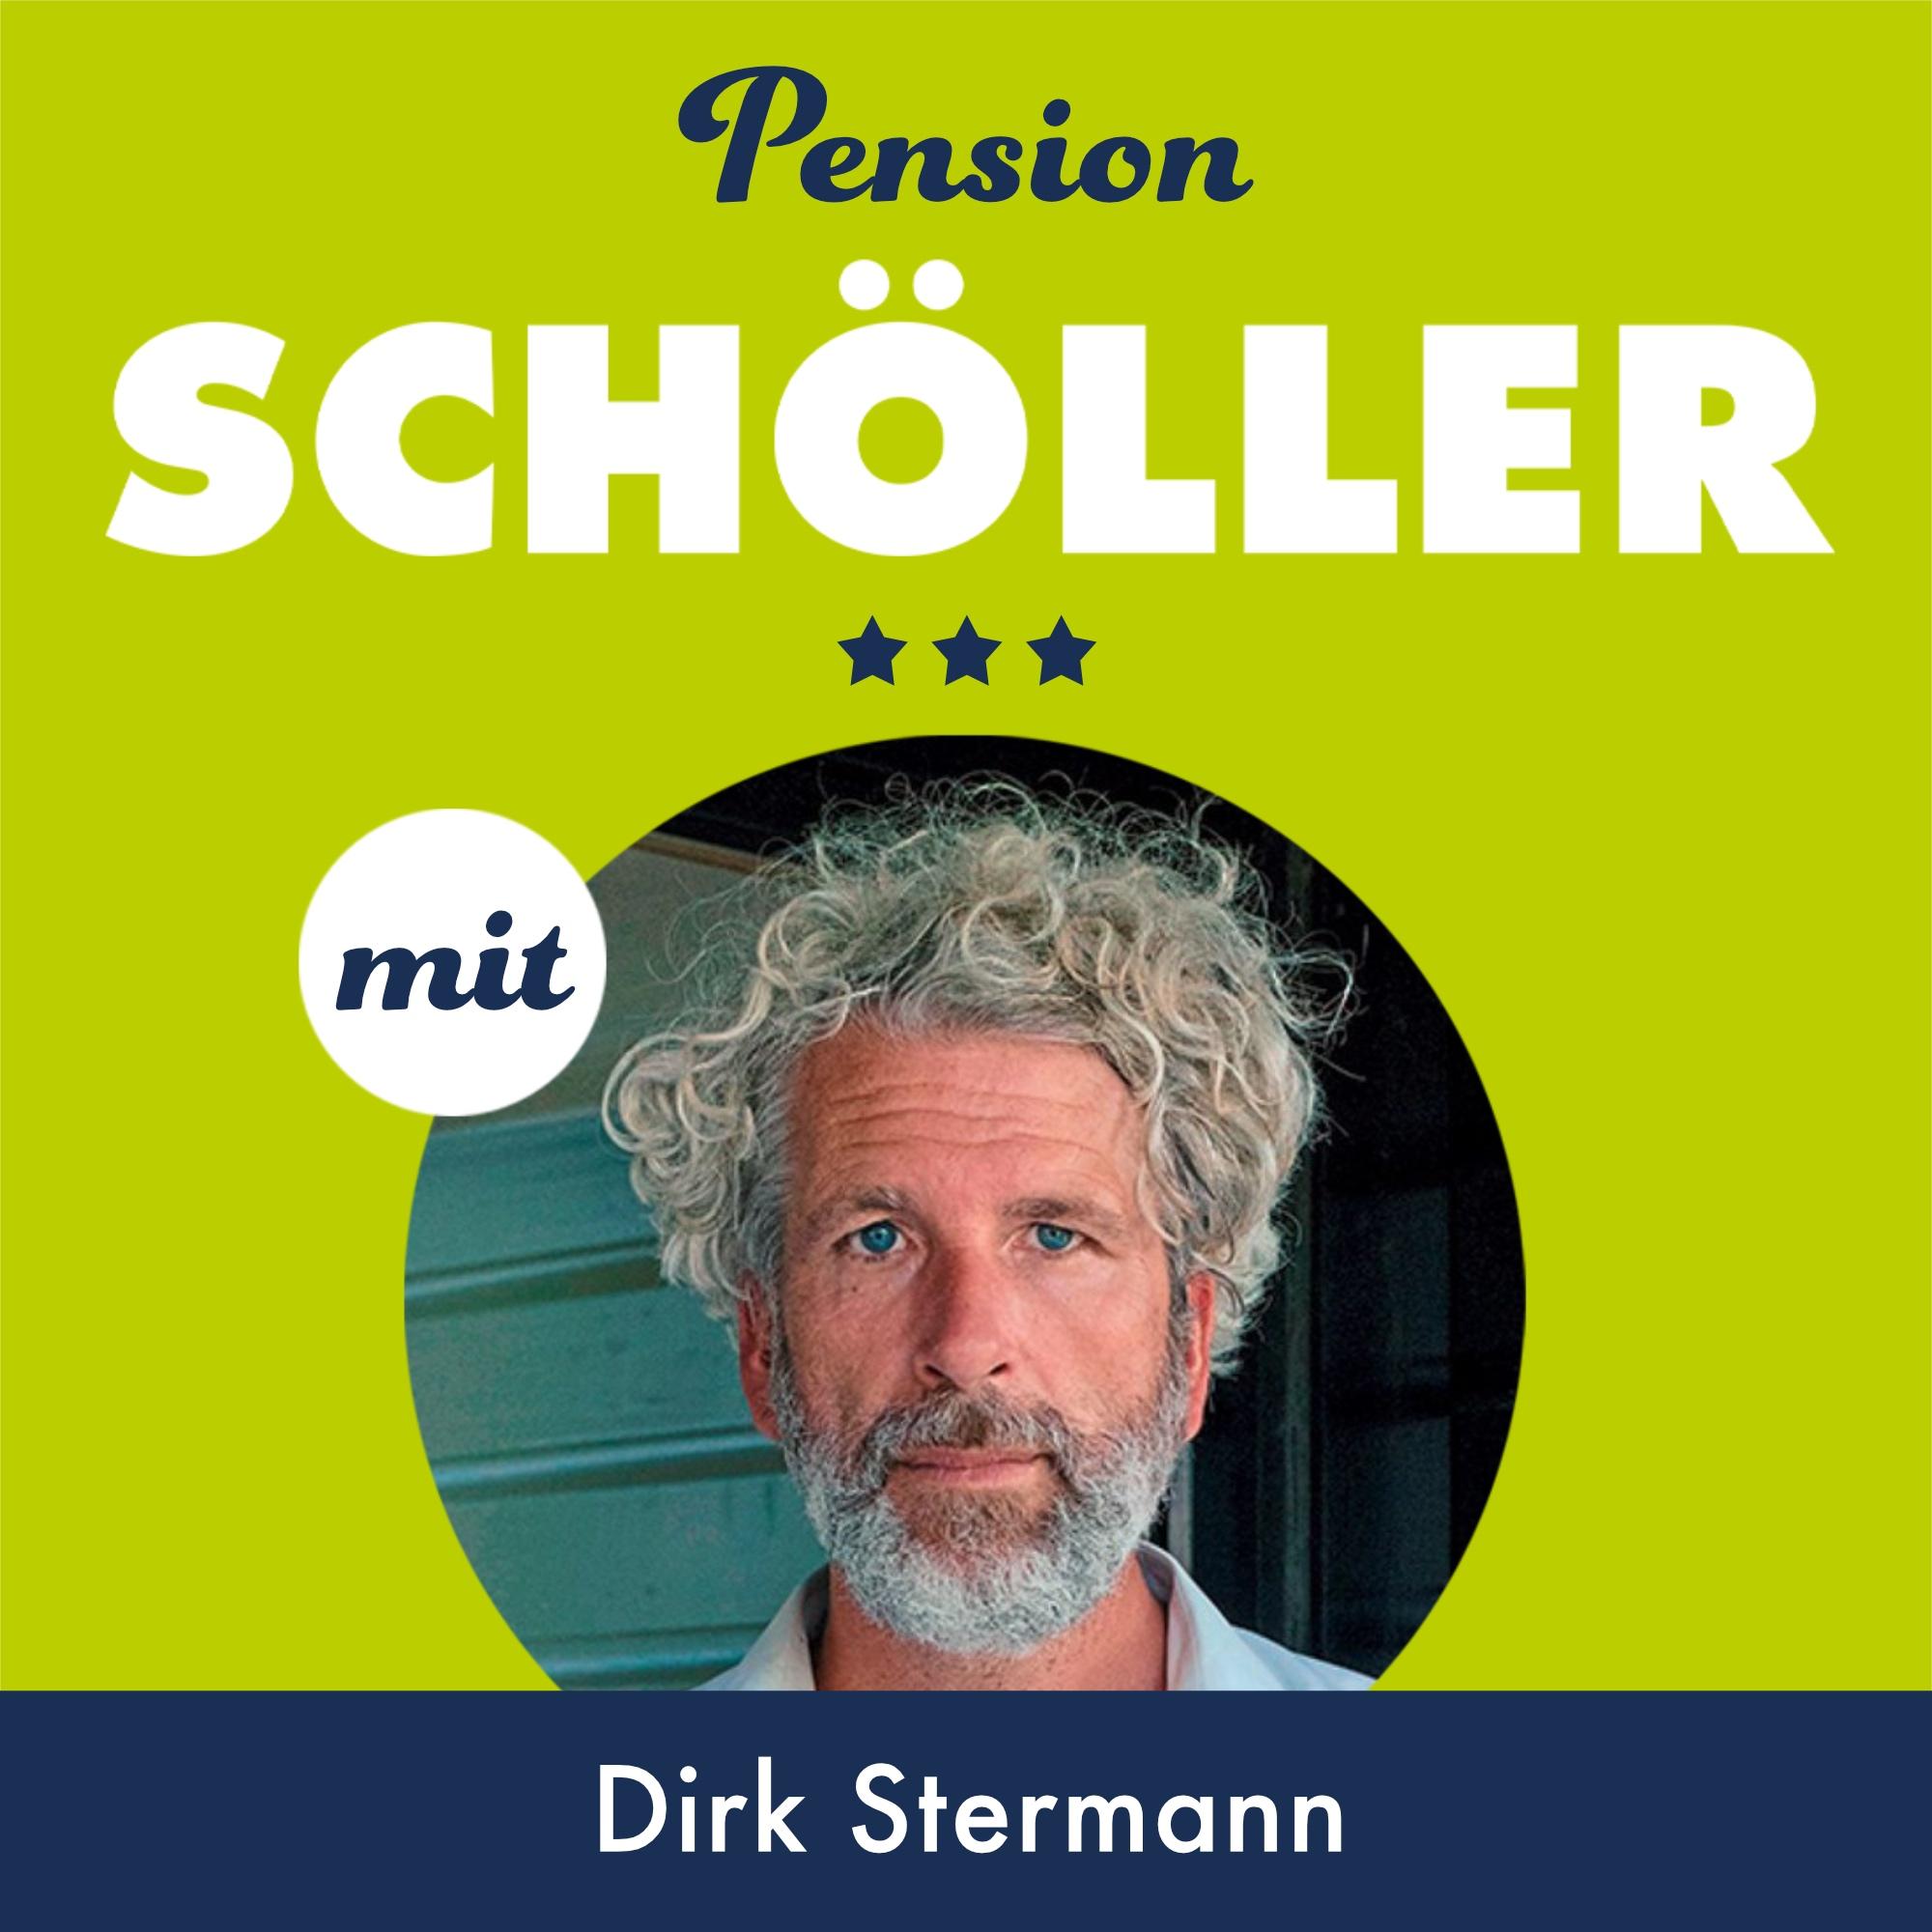 #12 Dirk Stermann